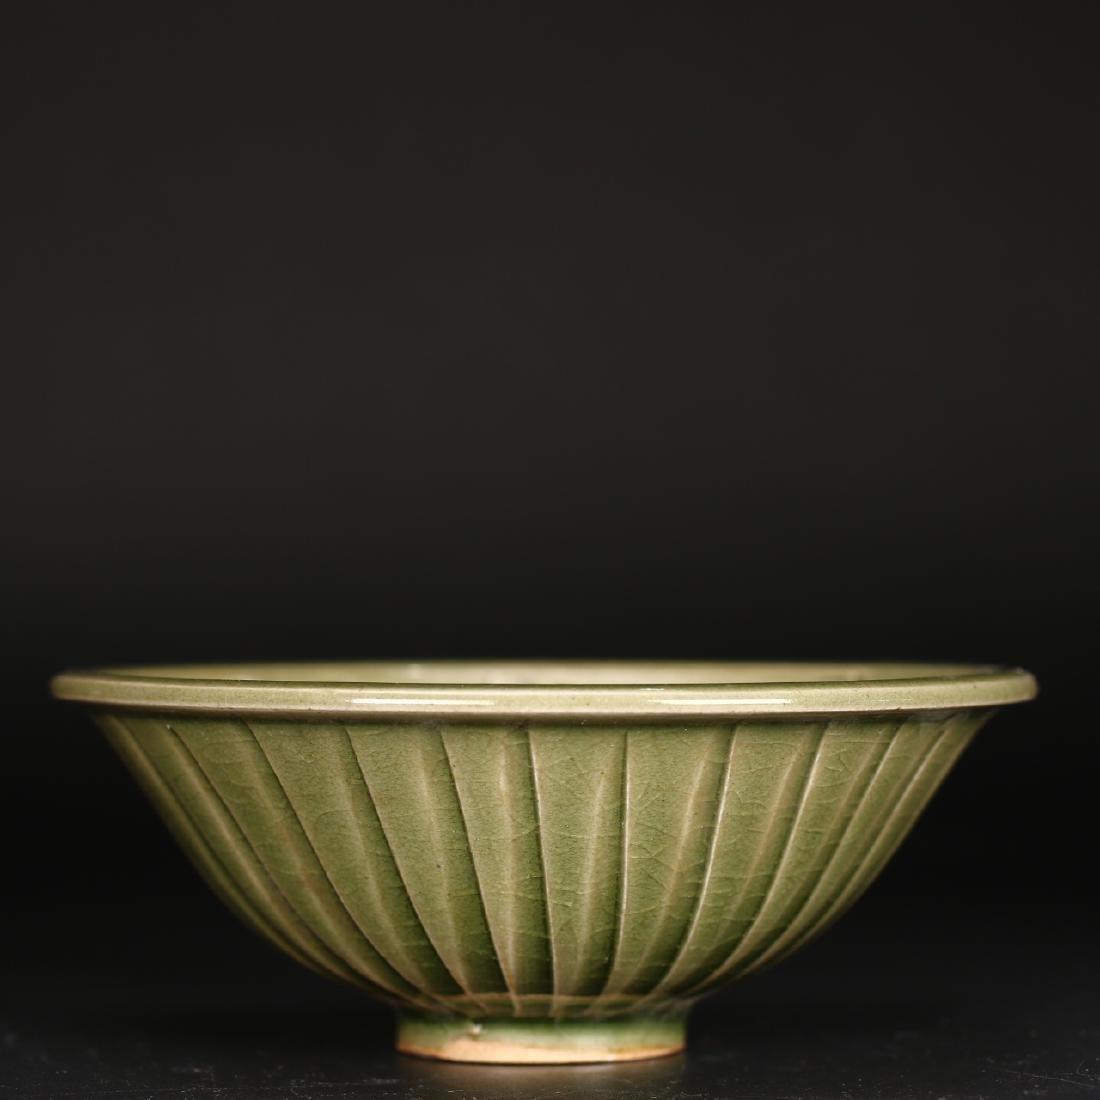 A Yaozhou ware bowl